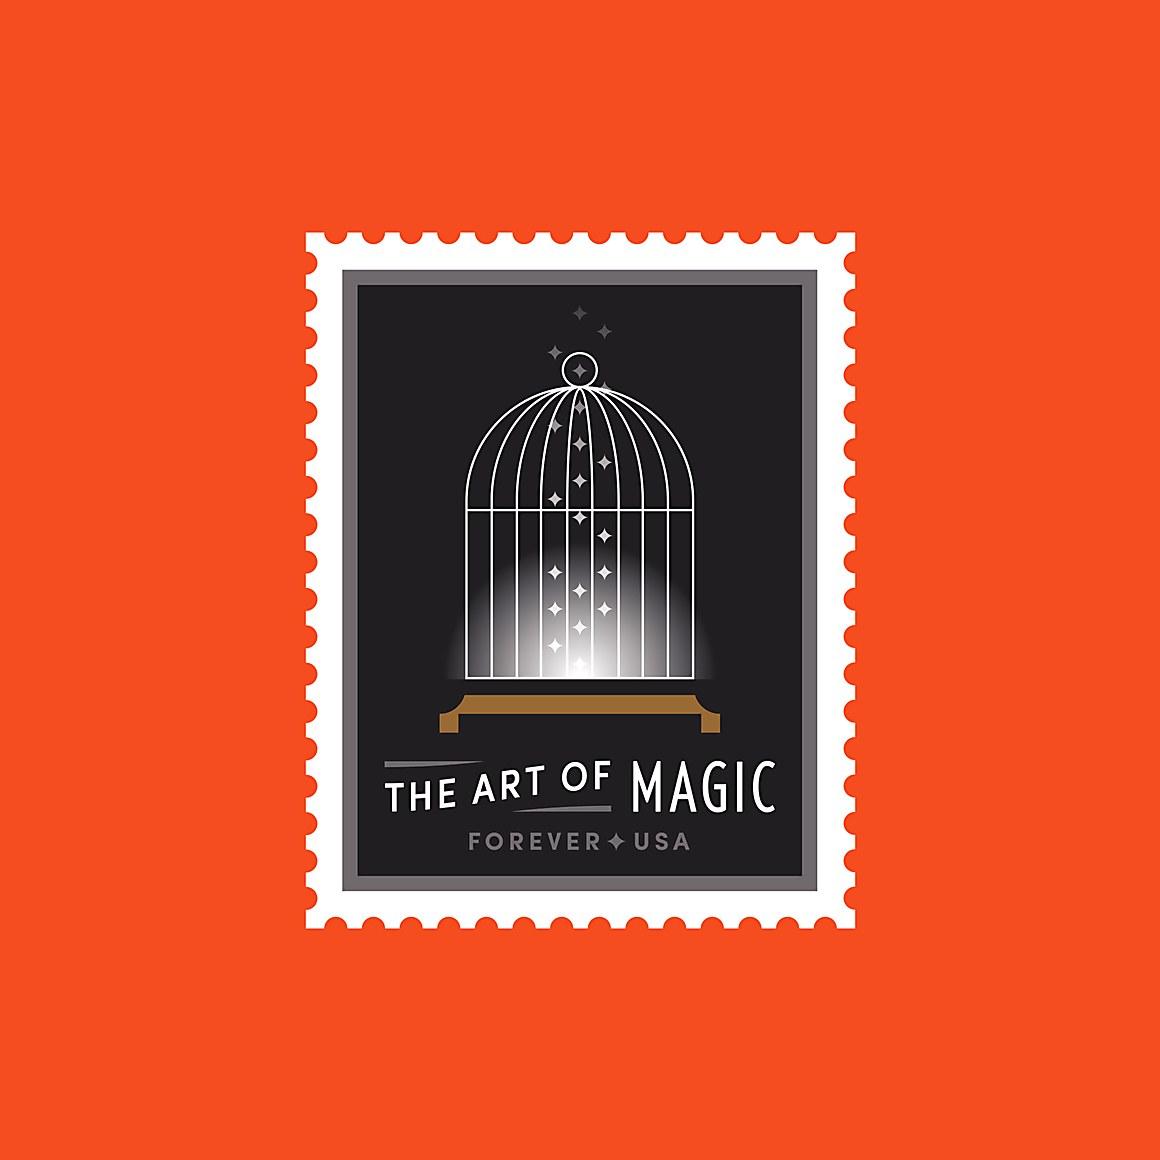 Usps the art of magic stamps communication arts greg breeding united states postal service art director j fletcher design design firm united states postal service client buycottarizona